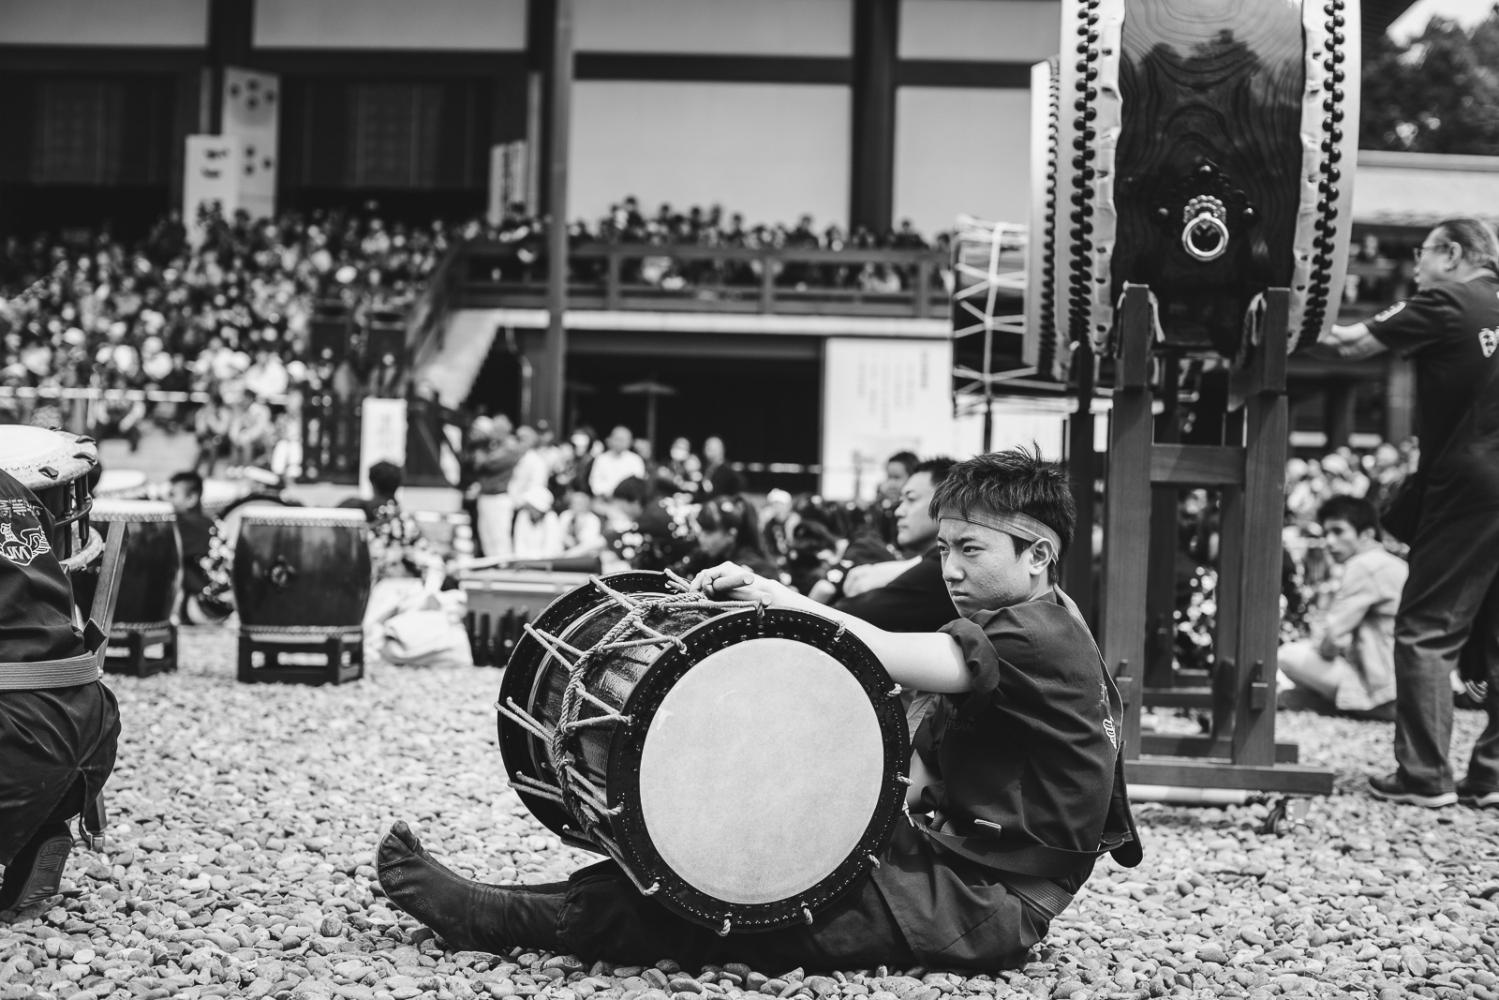 Narita Drum Festival (成田太鼓祭) Aprile 2017 (2017年4月)